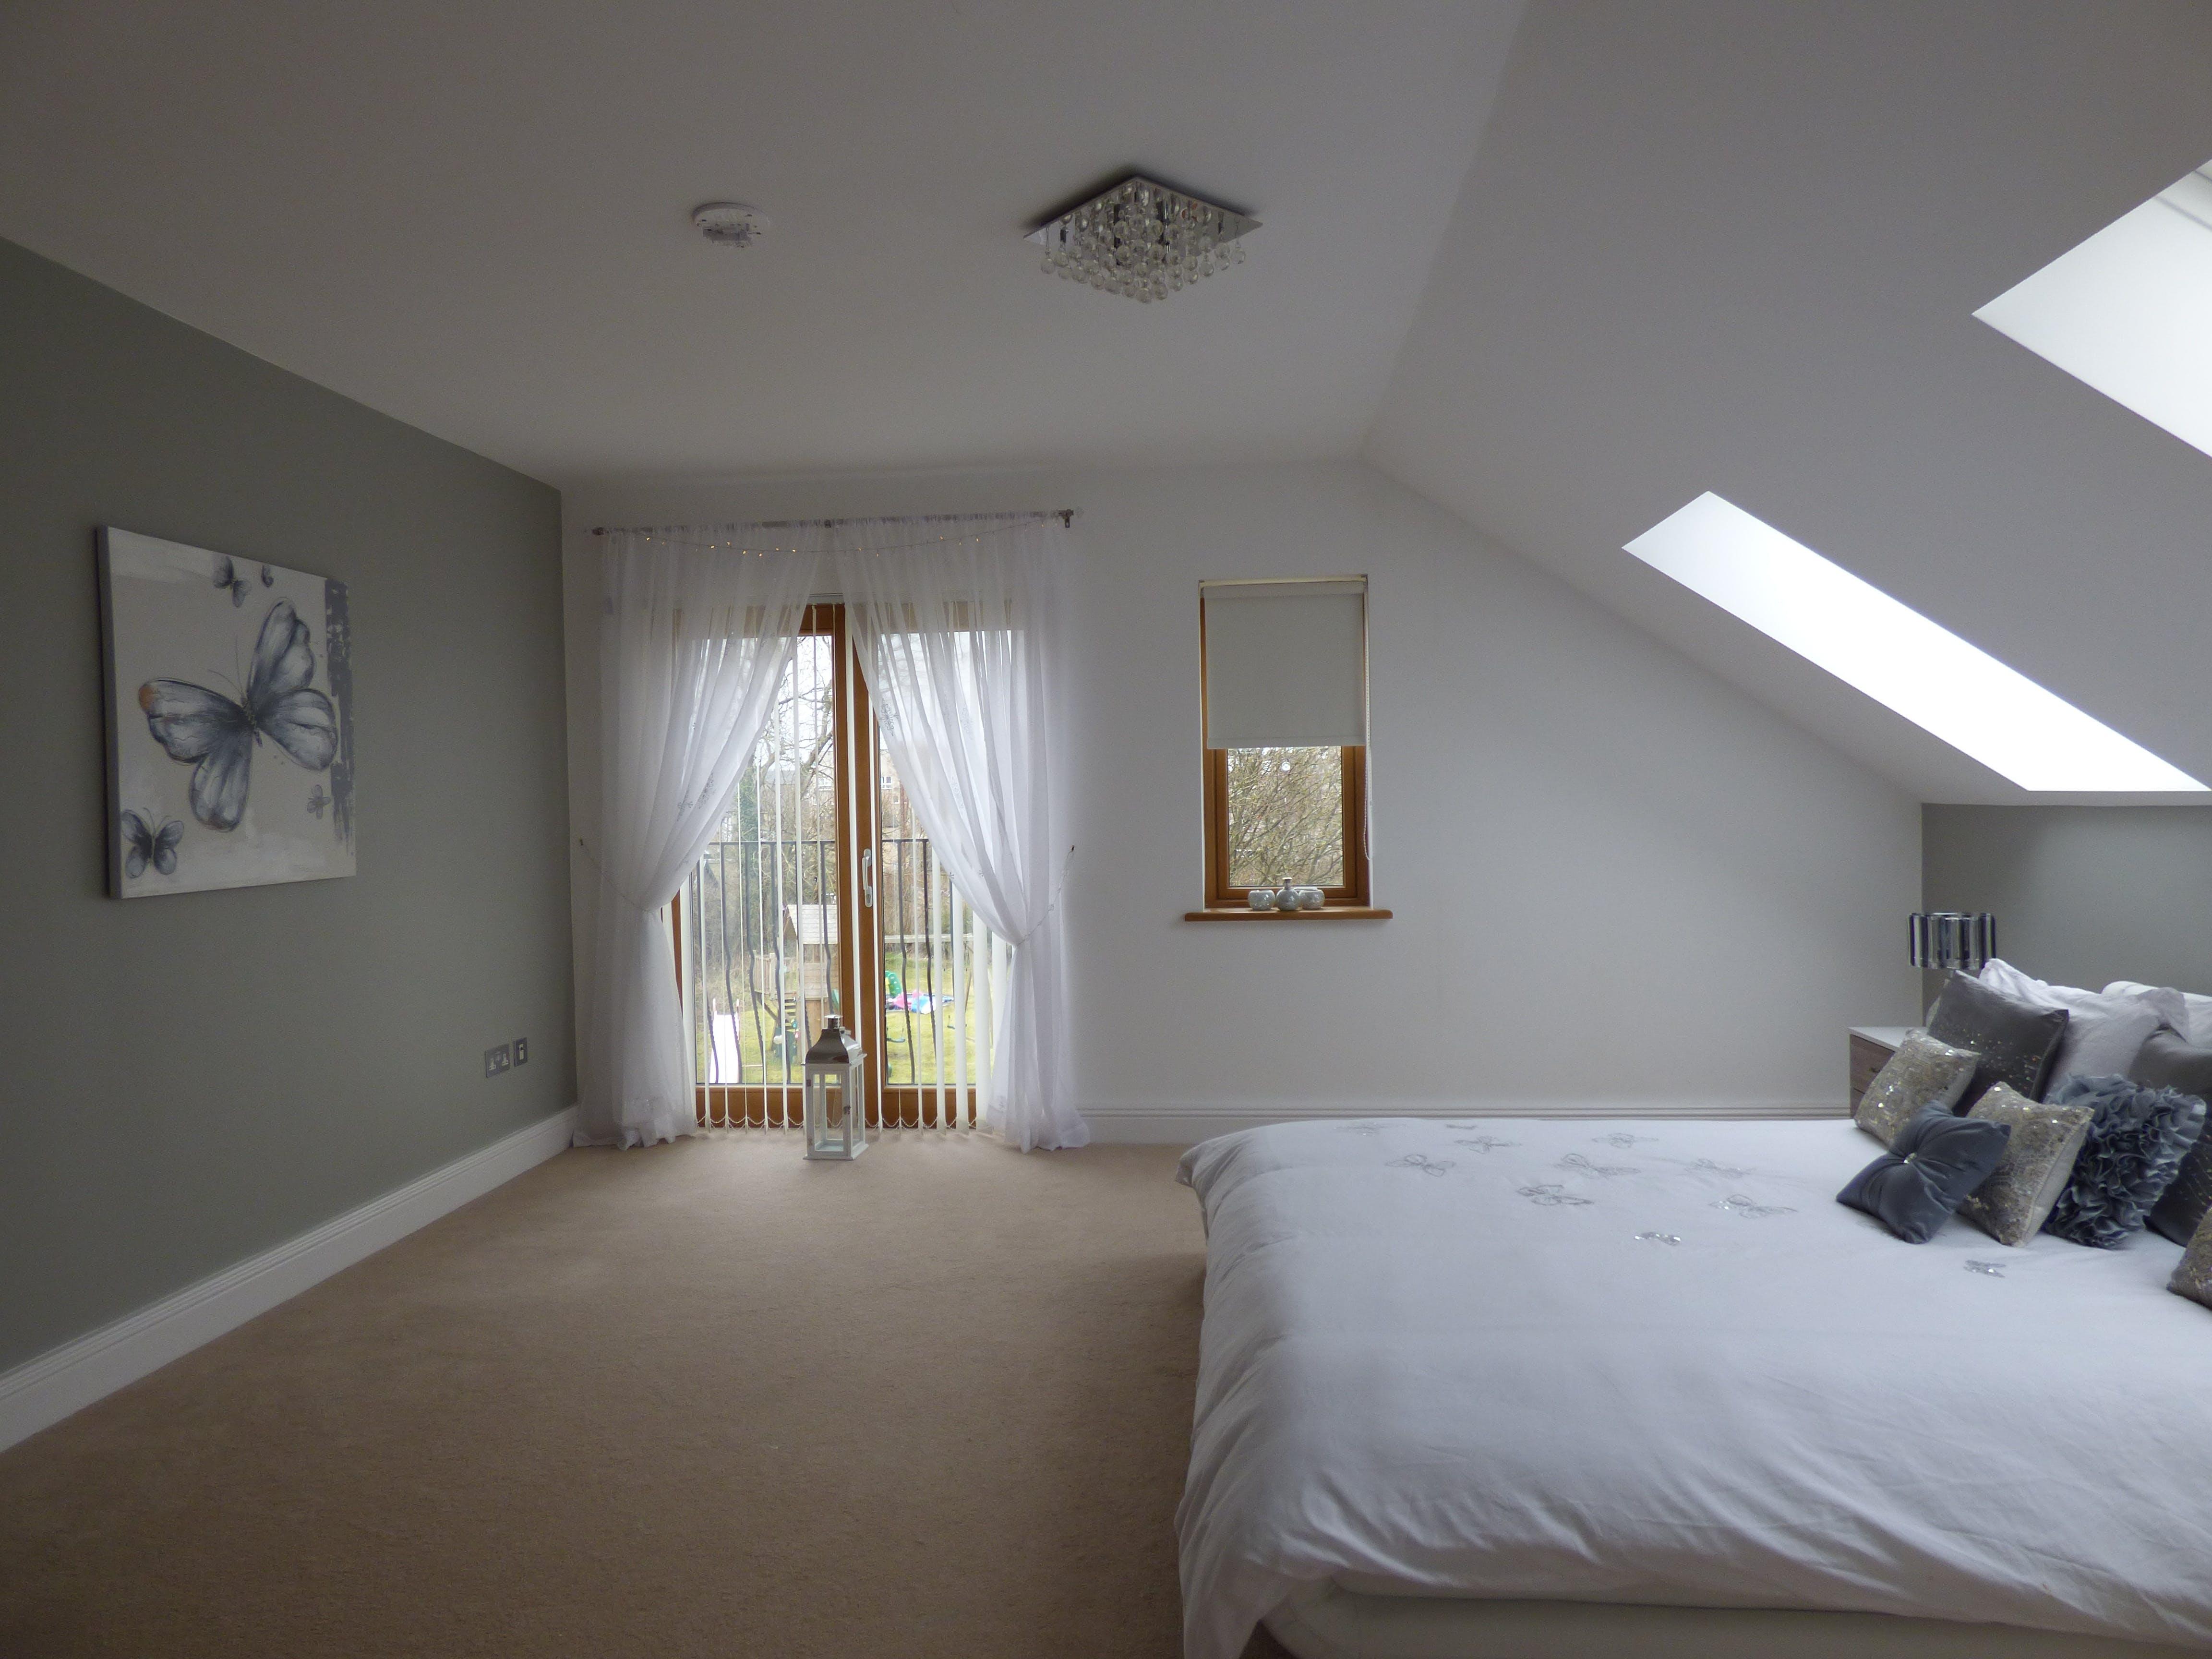 Open Room Curtain